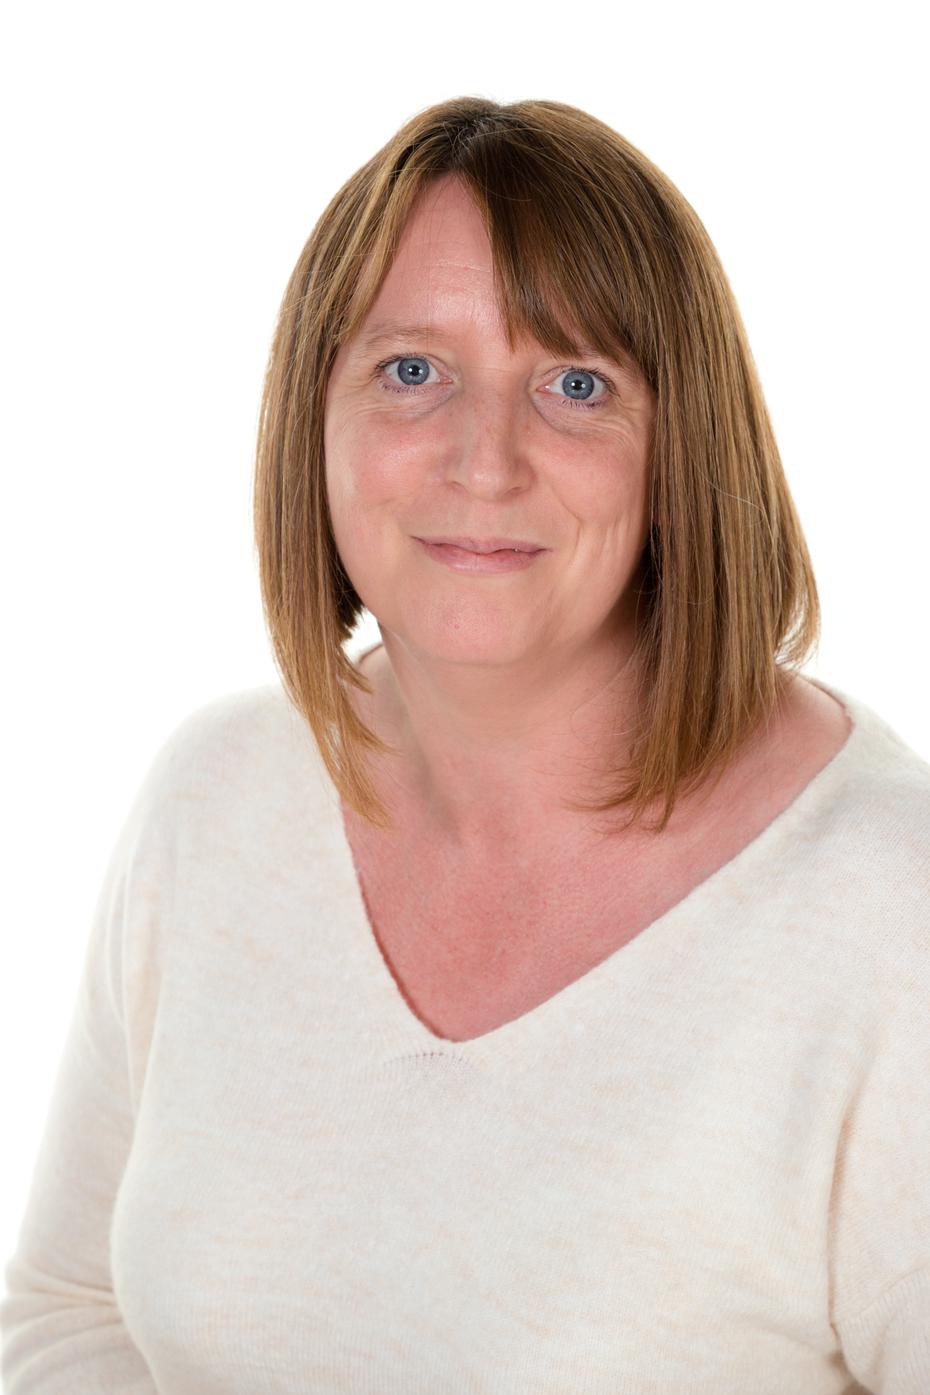 Maddie Bowley